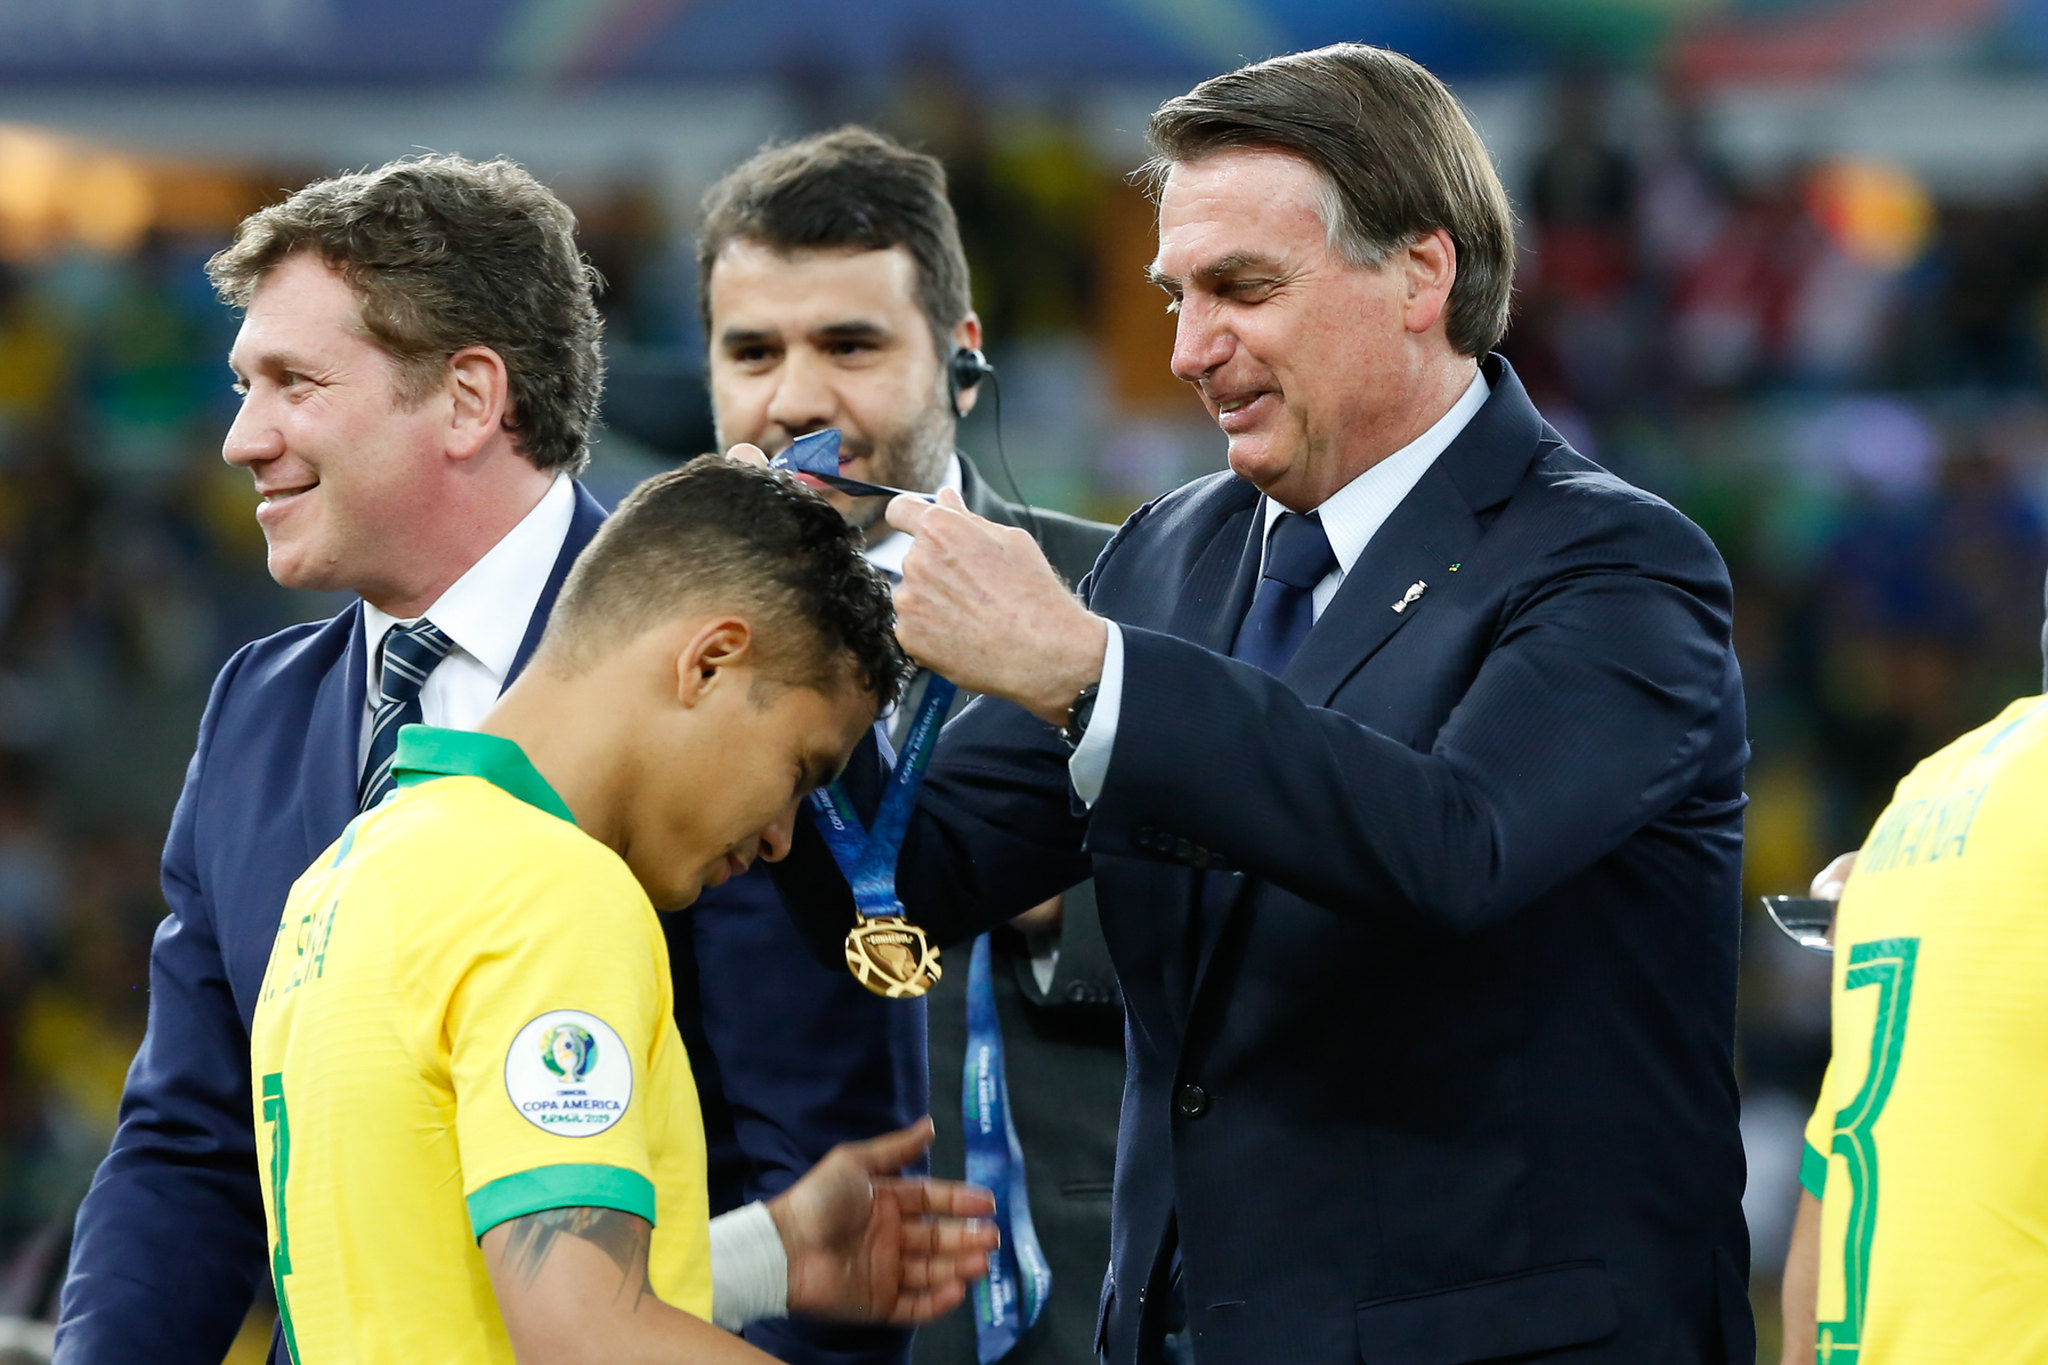 Presidente da República, Jair Bolsonaro, na Copa América